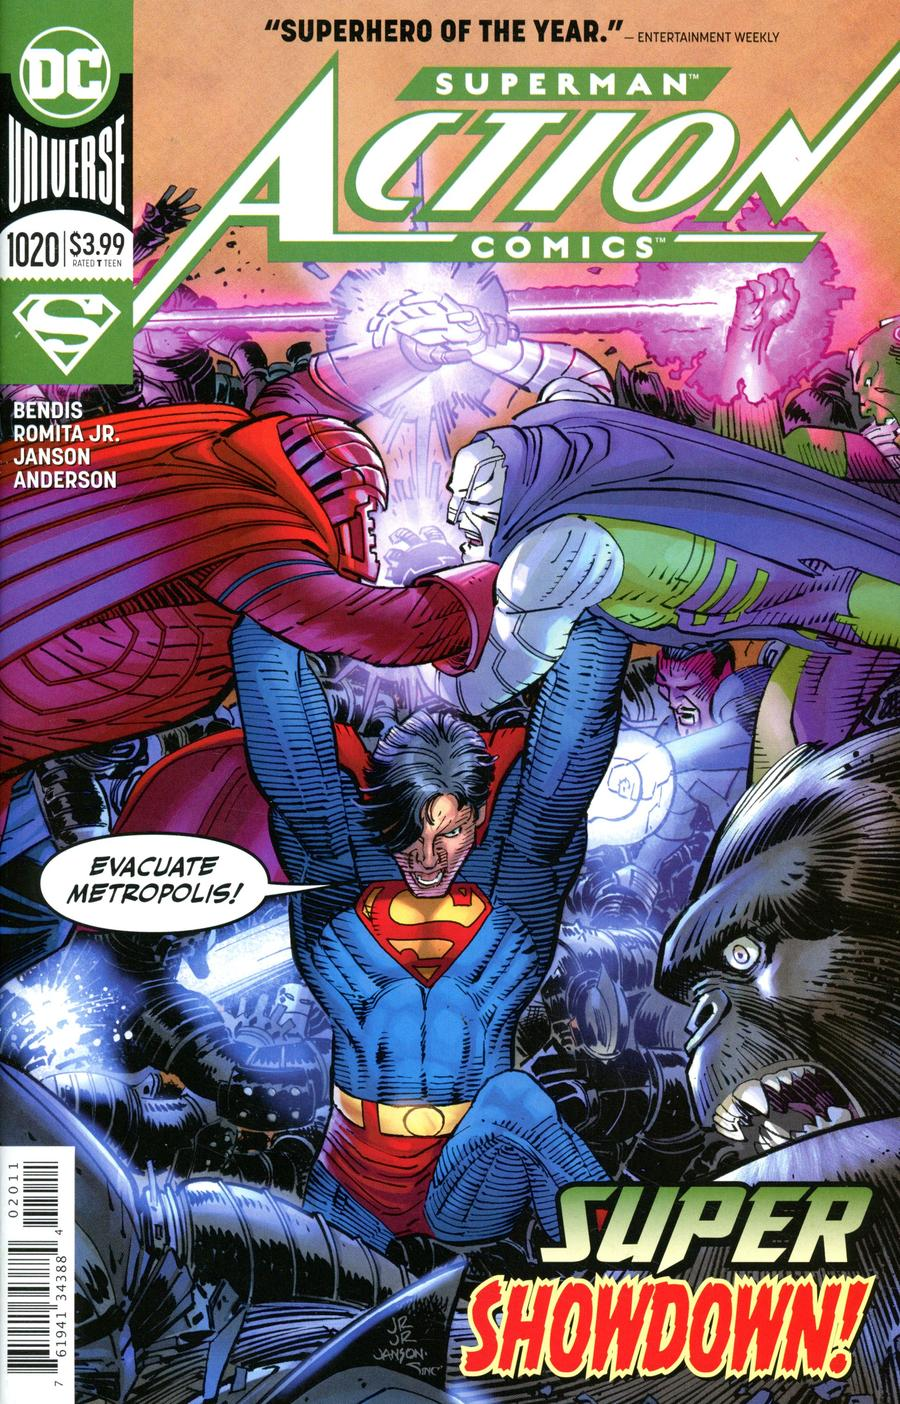 Action Comics #1020 (2020)